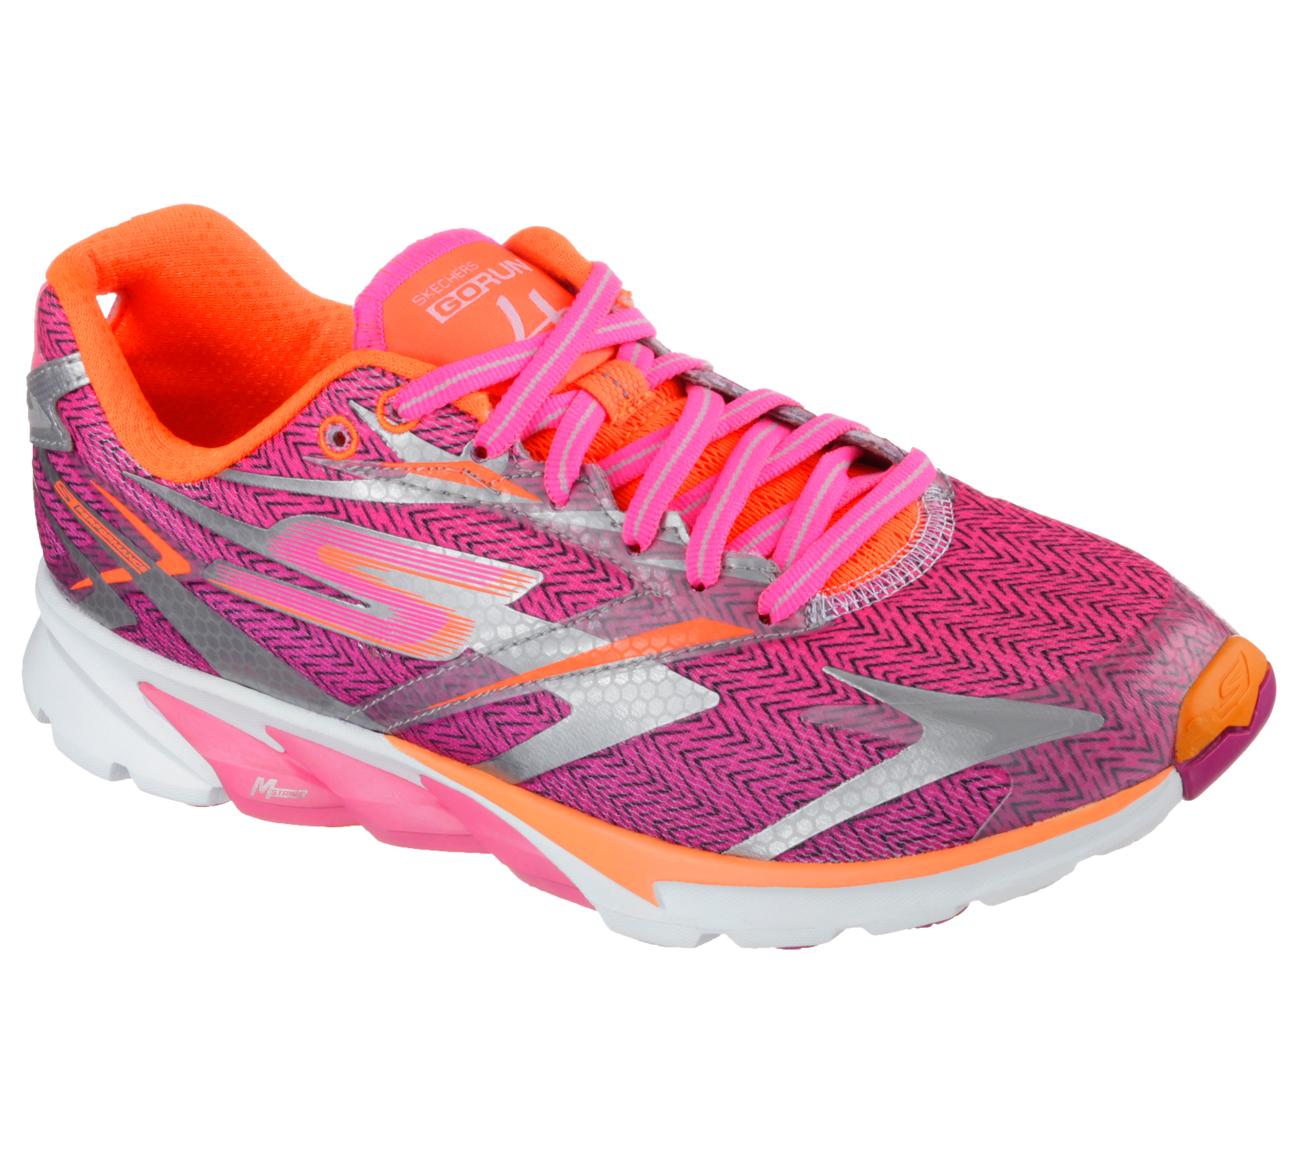 Women's Skechers GORun 2 Supreme Running Shoes - 13600 CCH